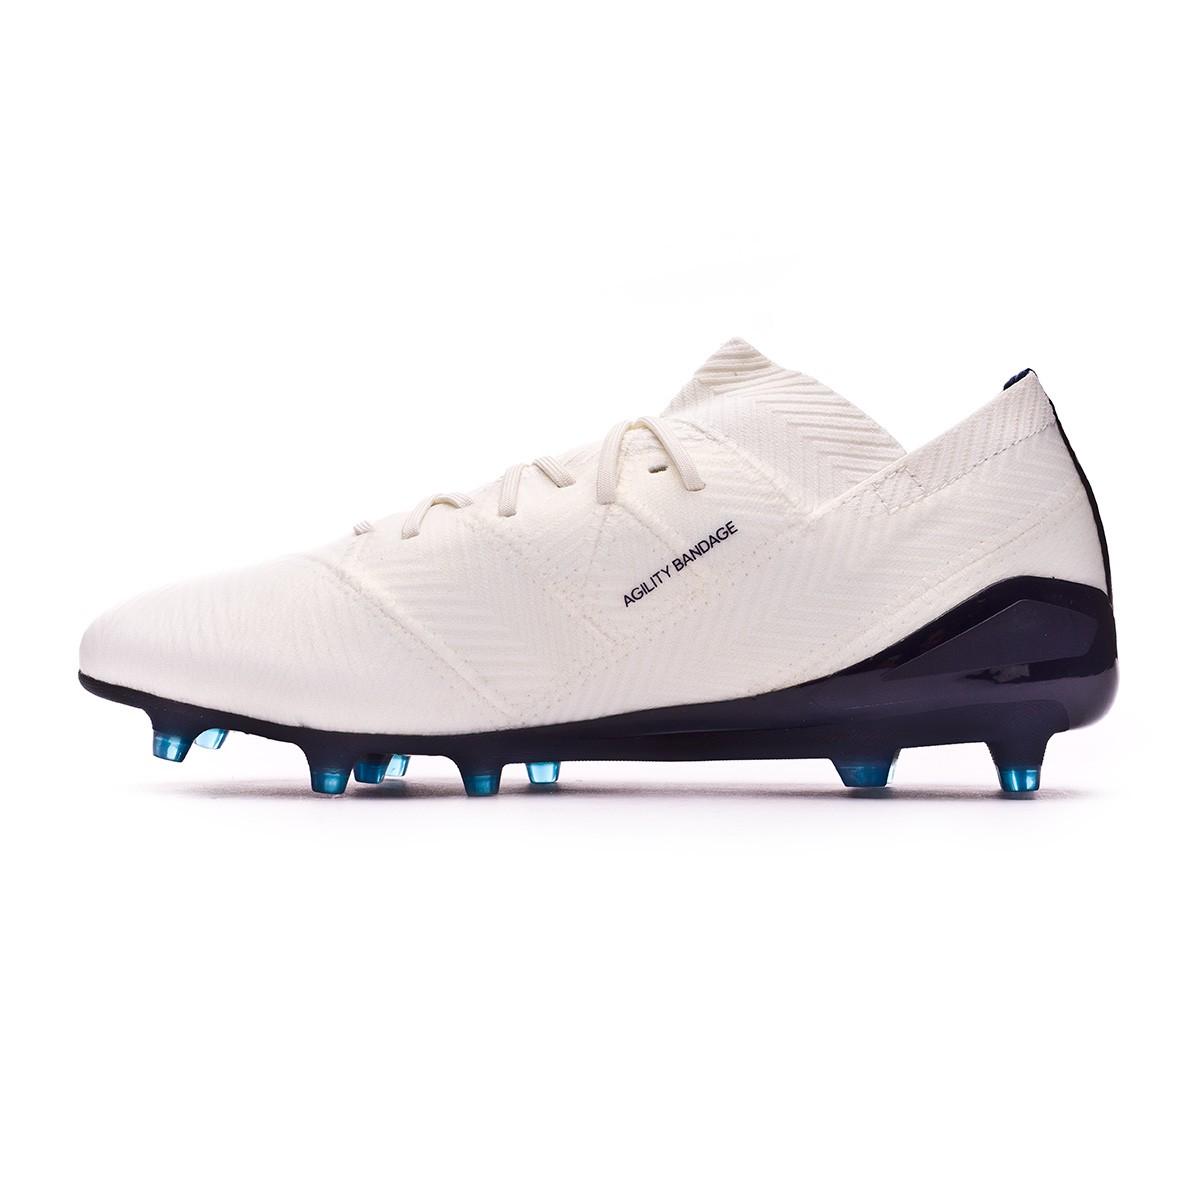 bf16adeee421 Football Boots adidas Woman Nemeziz 18.1 FG Off white-Legend ink-Hire blue  - Football store Fútbol Emotion